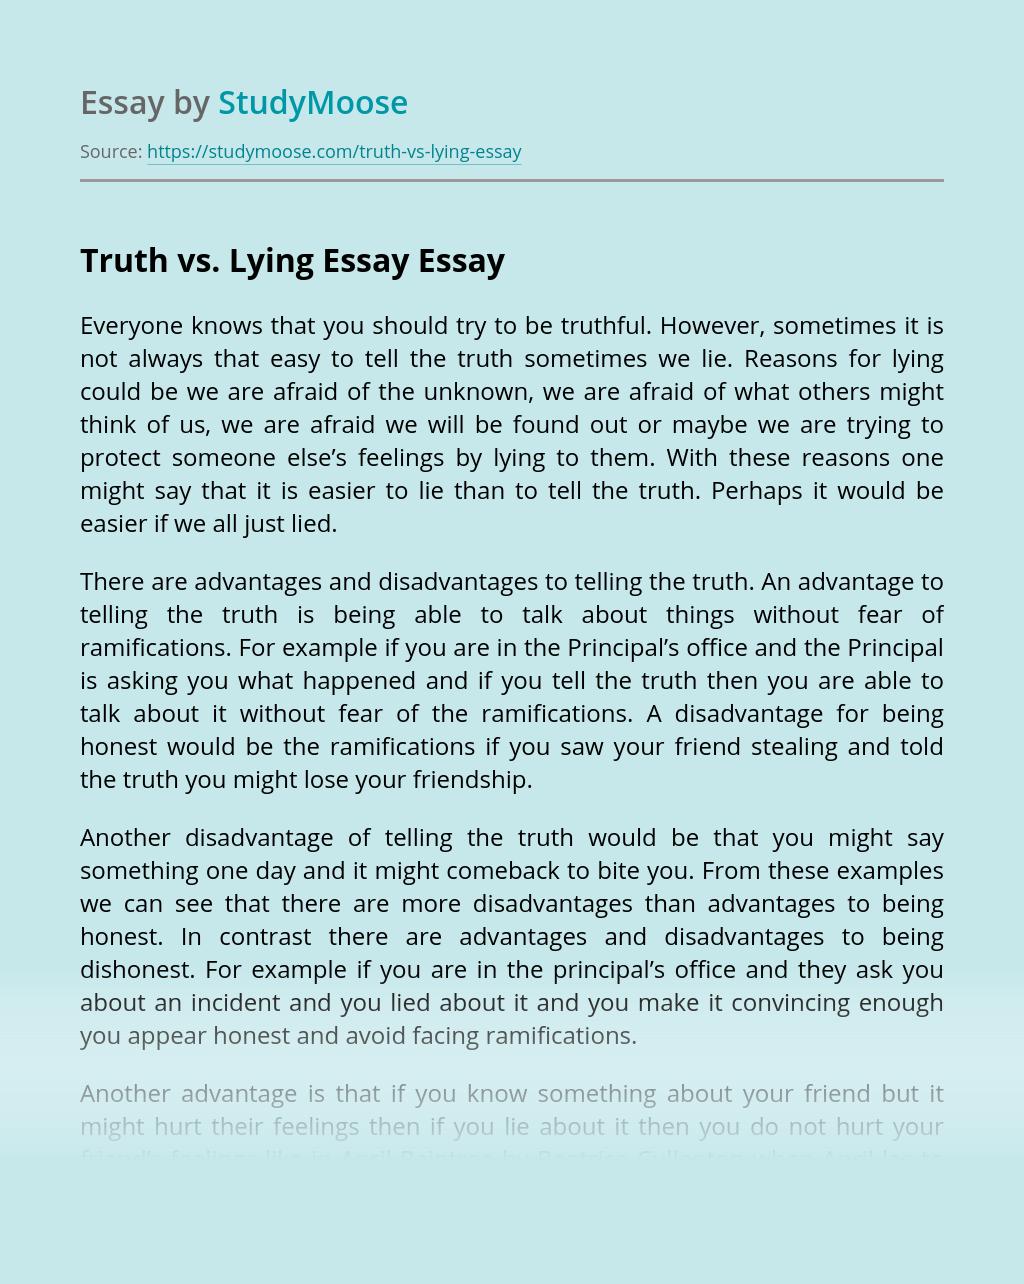 Truth vs. Lying Essay